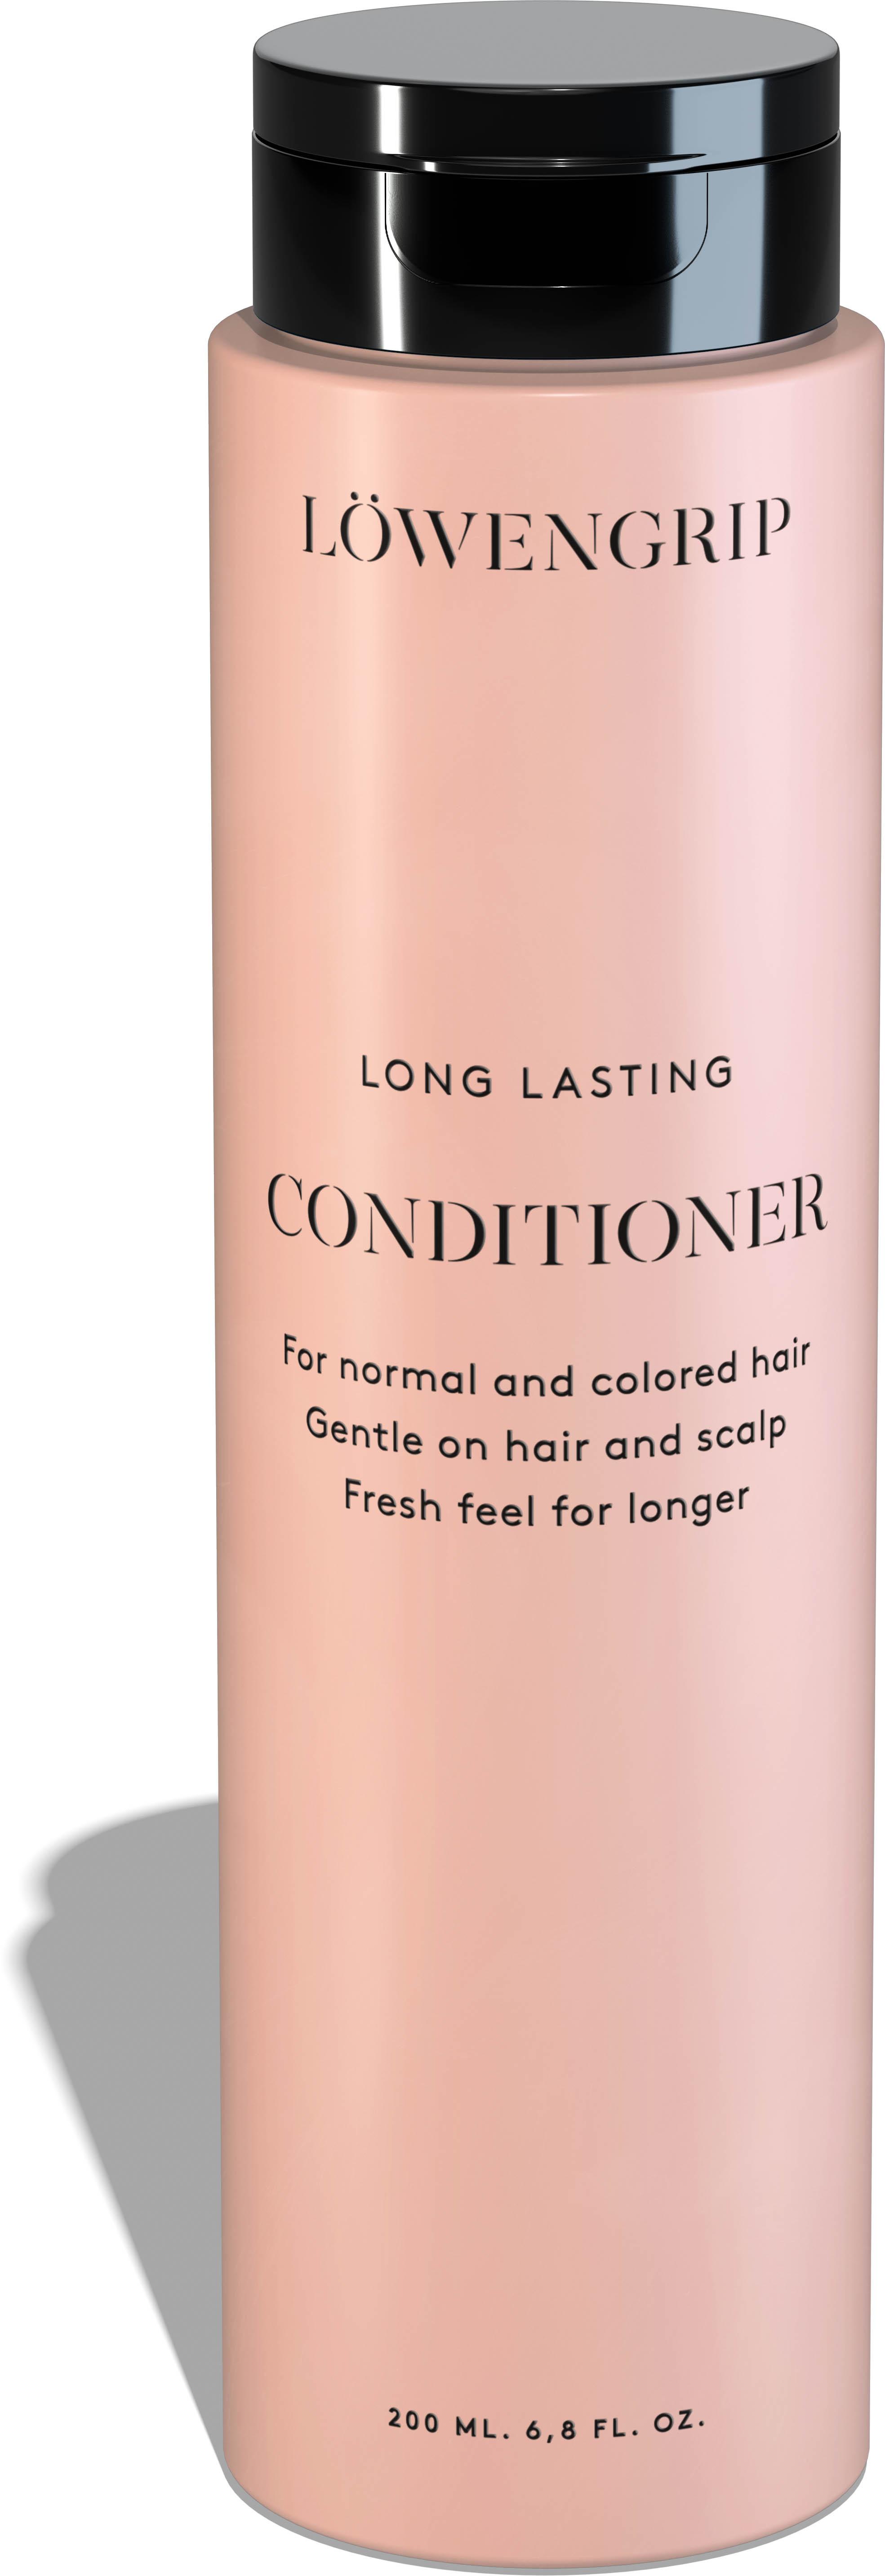 Long Lasting - Conditioner 200ml